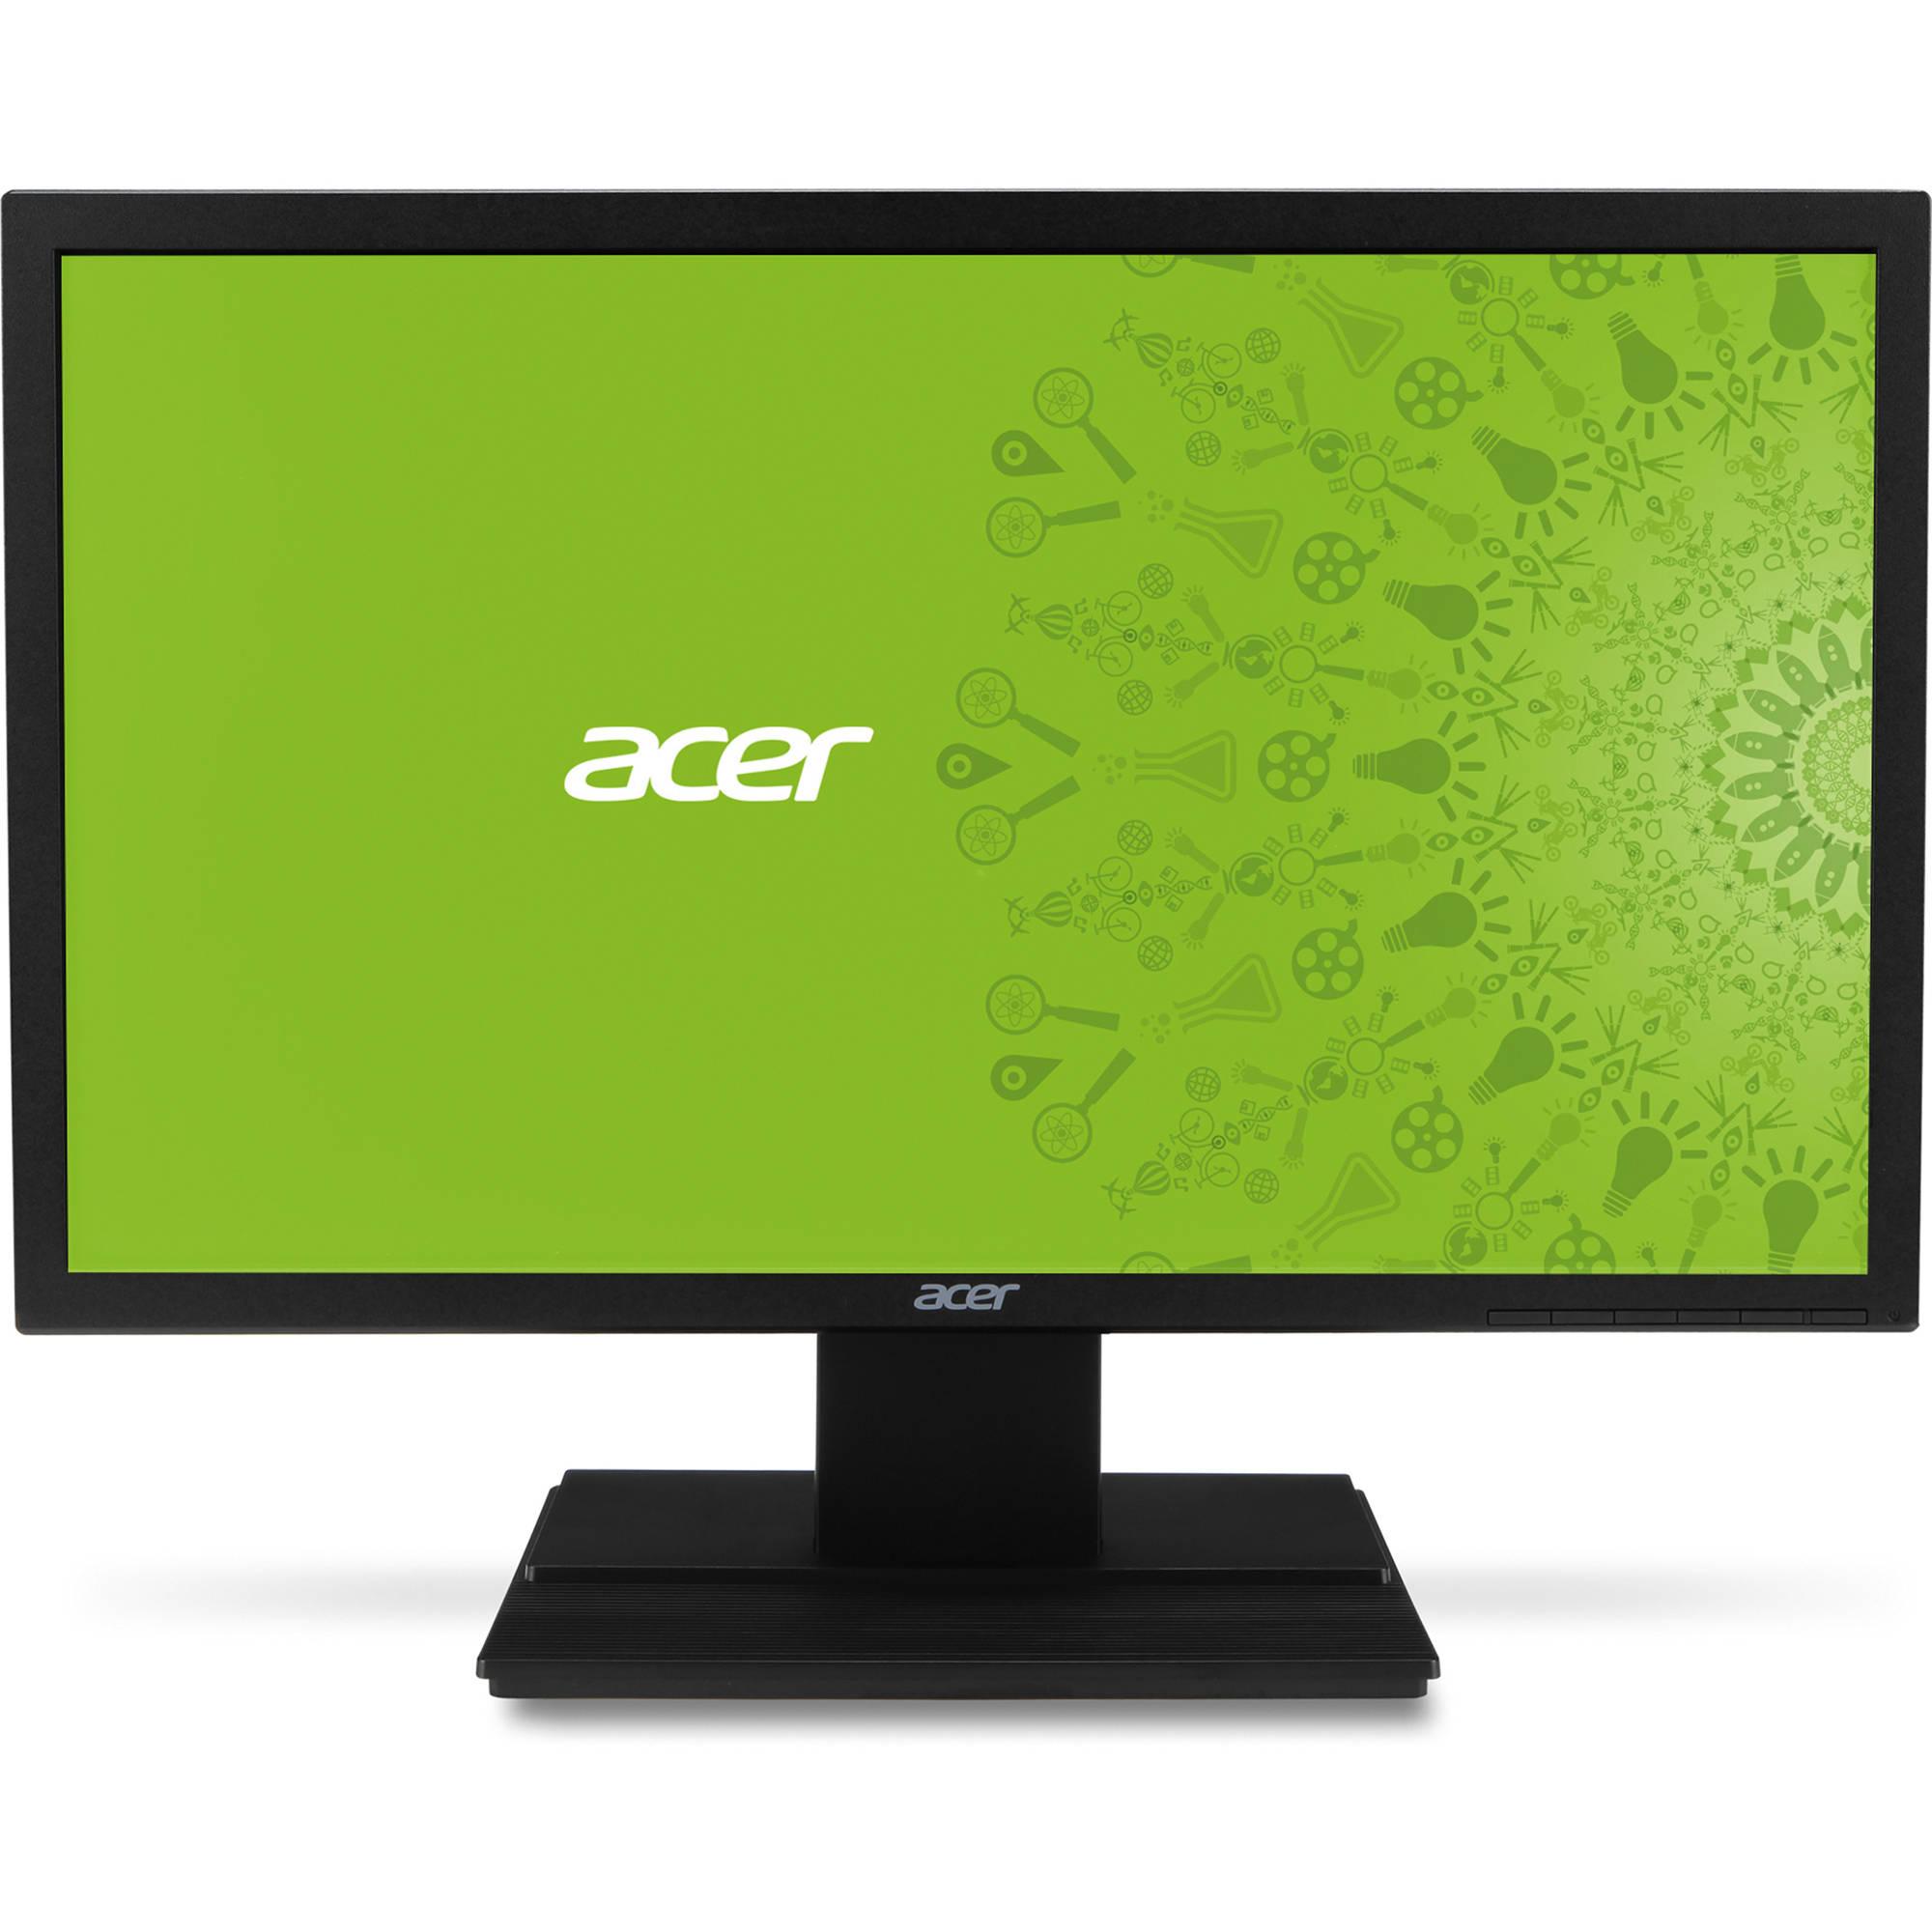 Led Monitor: Led Monitor No Signal